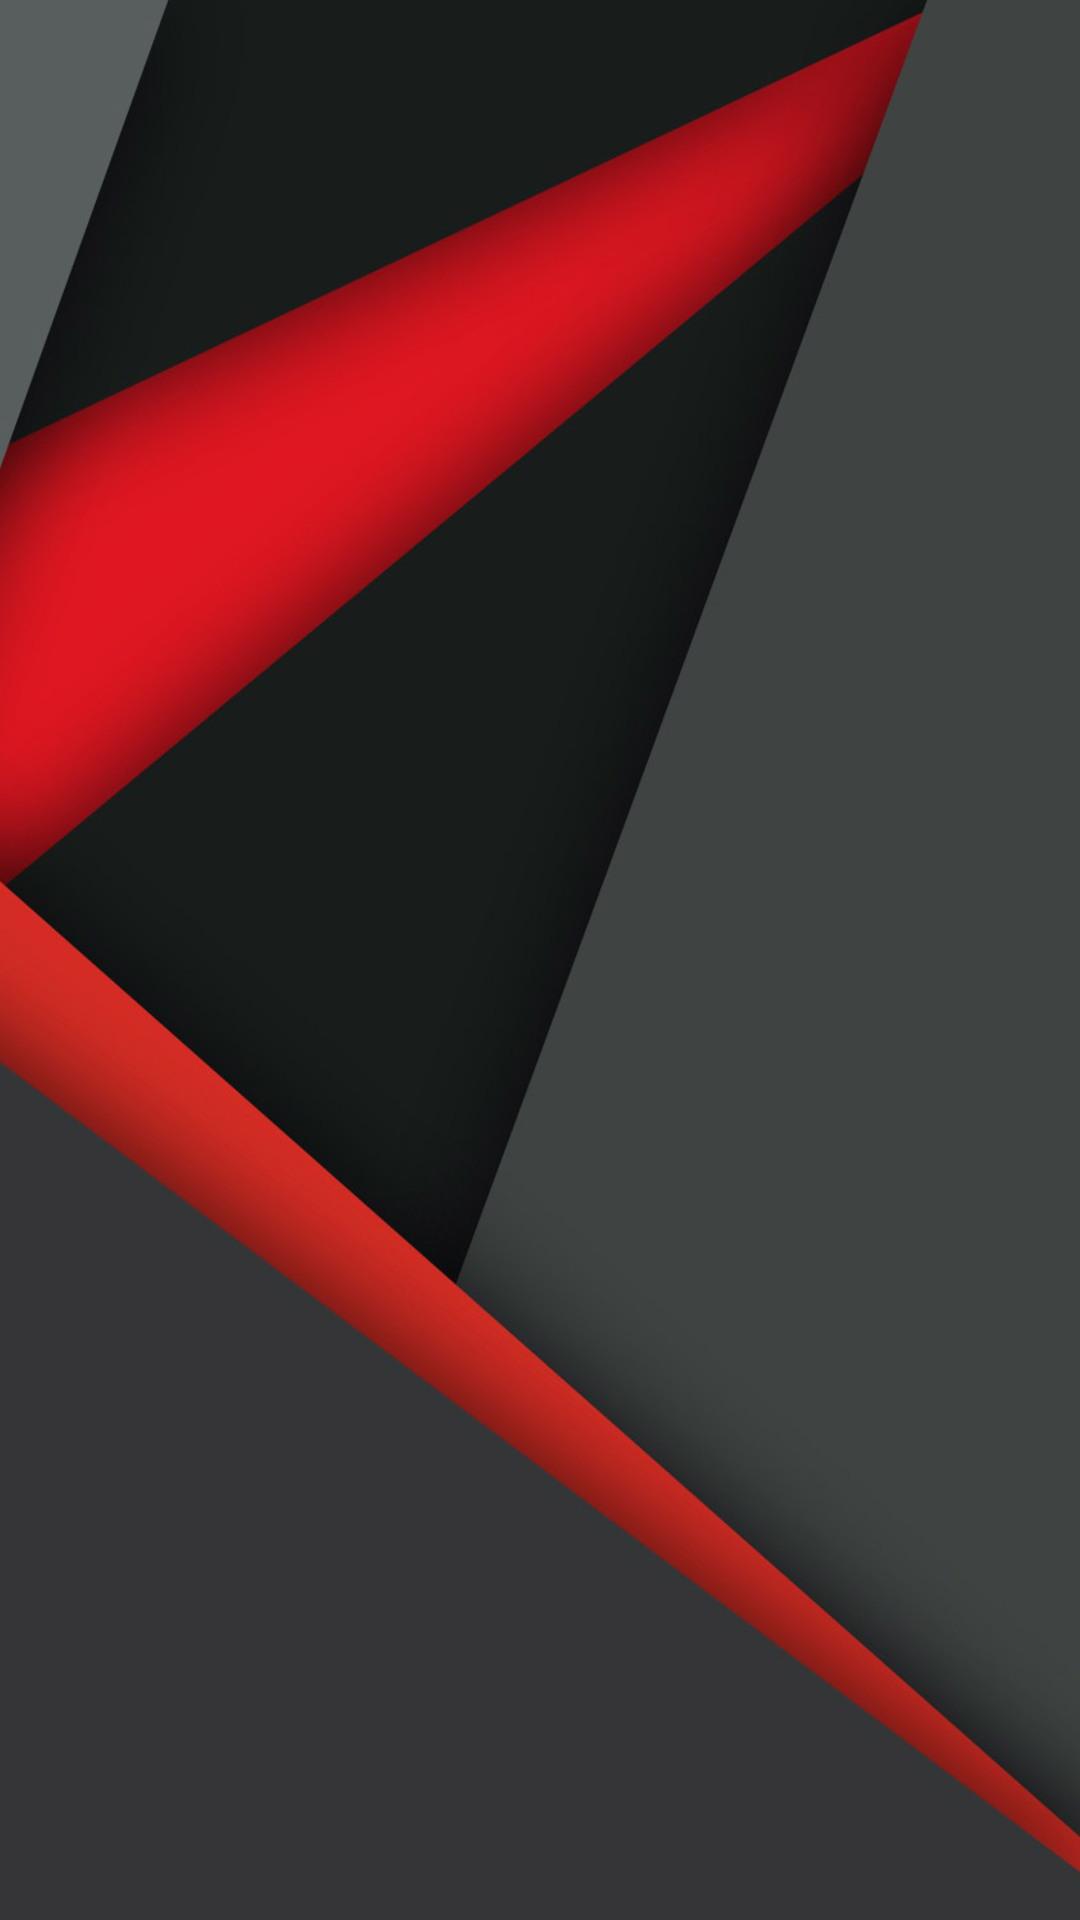 1080x1920 Material Design Dark Red Black Iphone 7,6s,6 ...